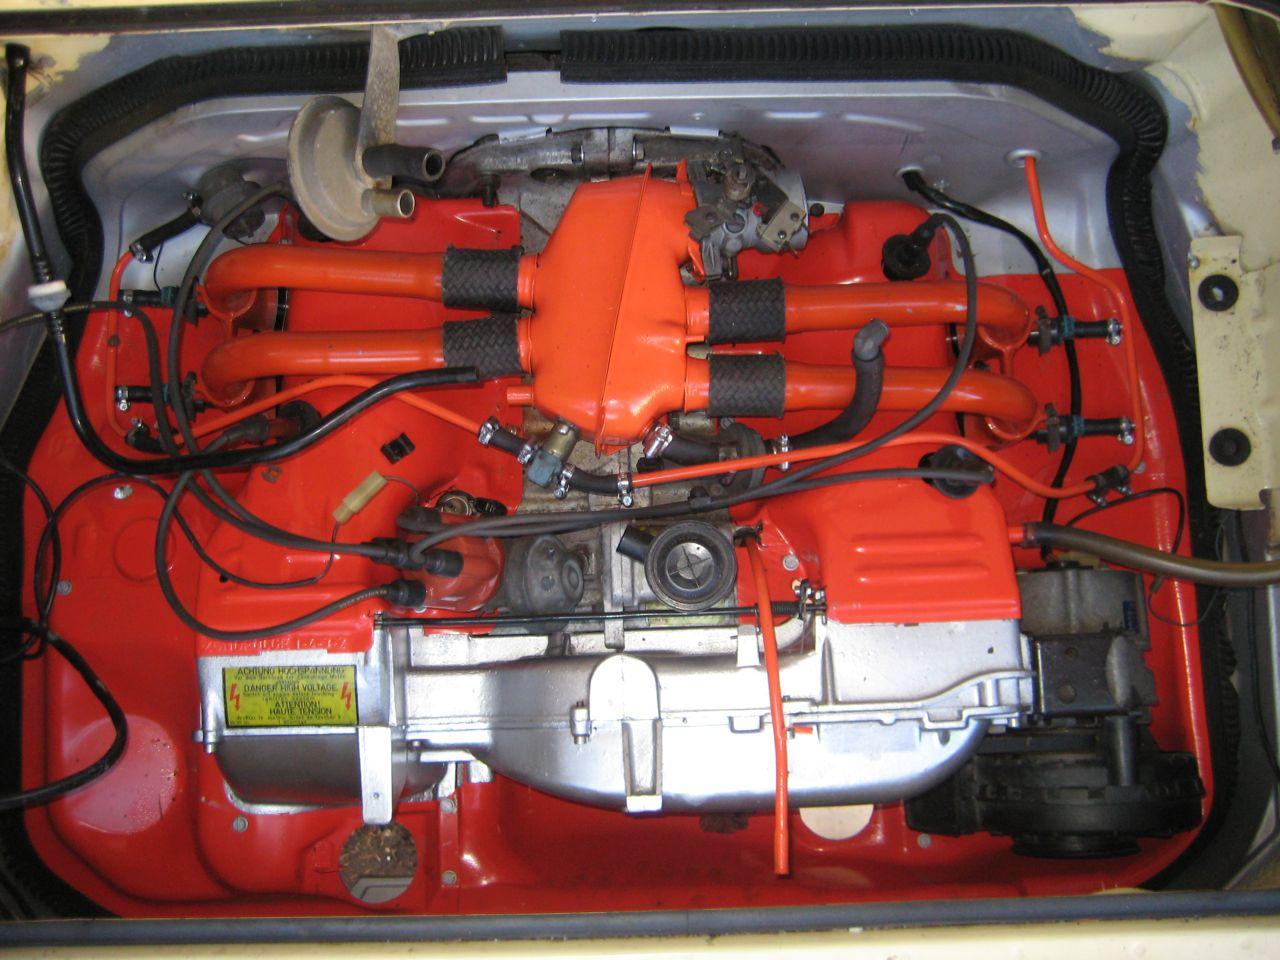 hight resolution of 82 vanagon engine diagram diagram auto parts catalog and gti engine diagram 1991 vanagon engine